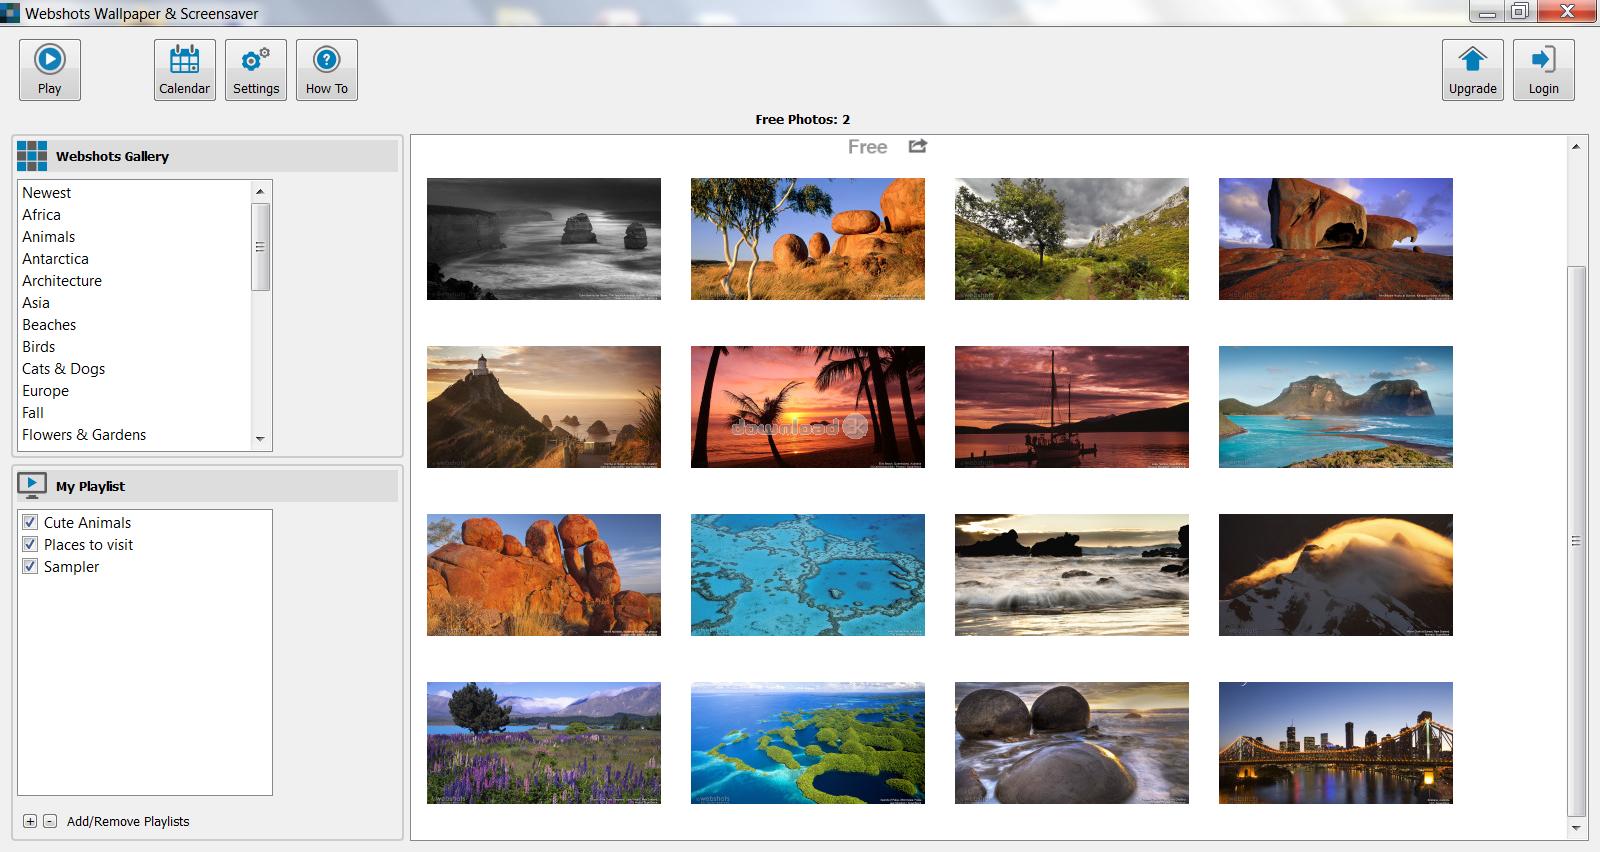 Download free glenn desktop calendar, glenn desktop calendar 1. 34.